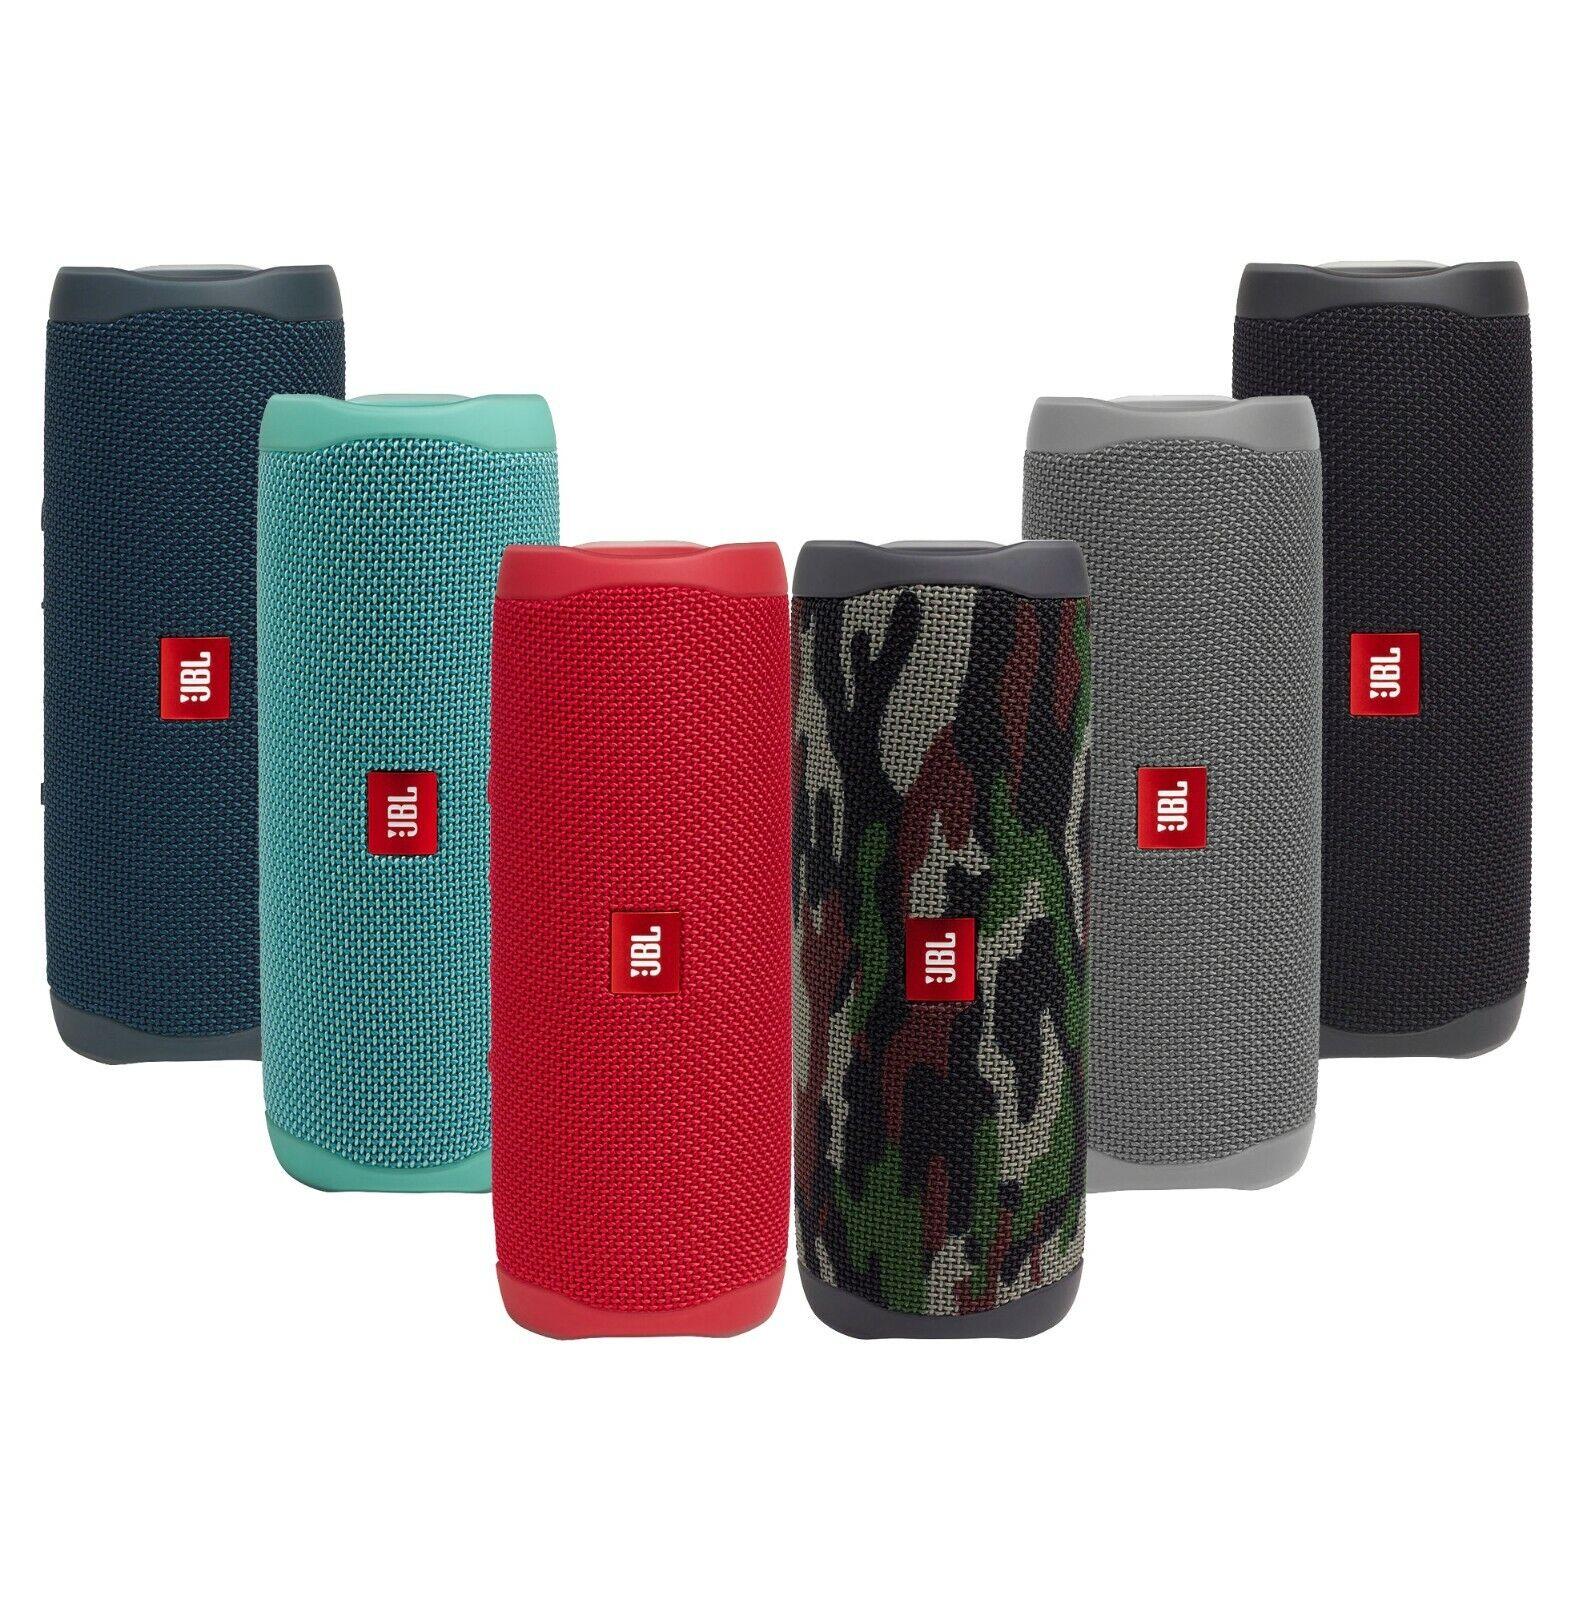 JBL Flip 5 Waterproof Portable Rechargeable Bluetooth Speake